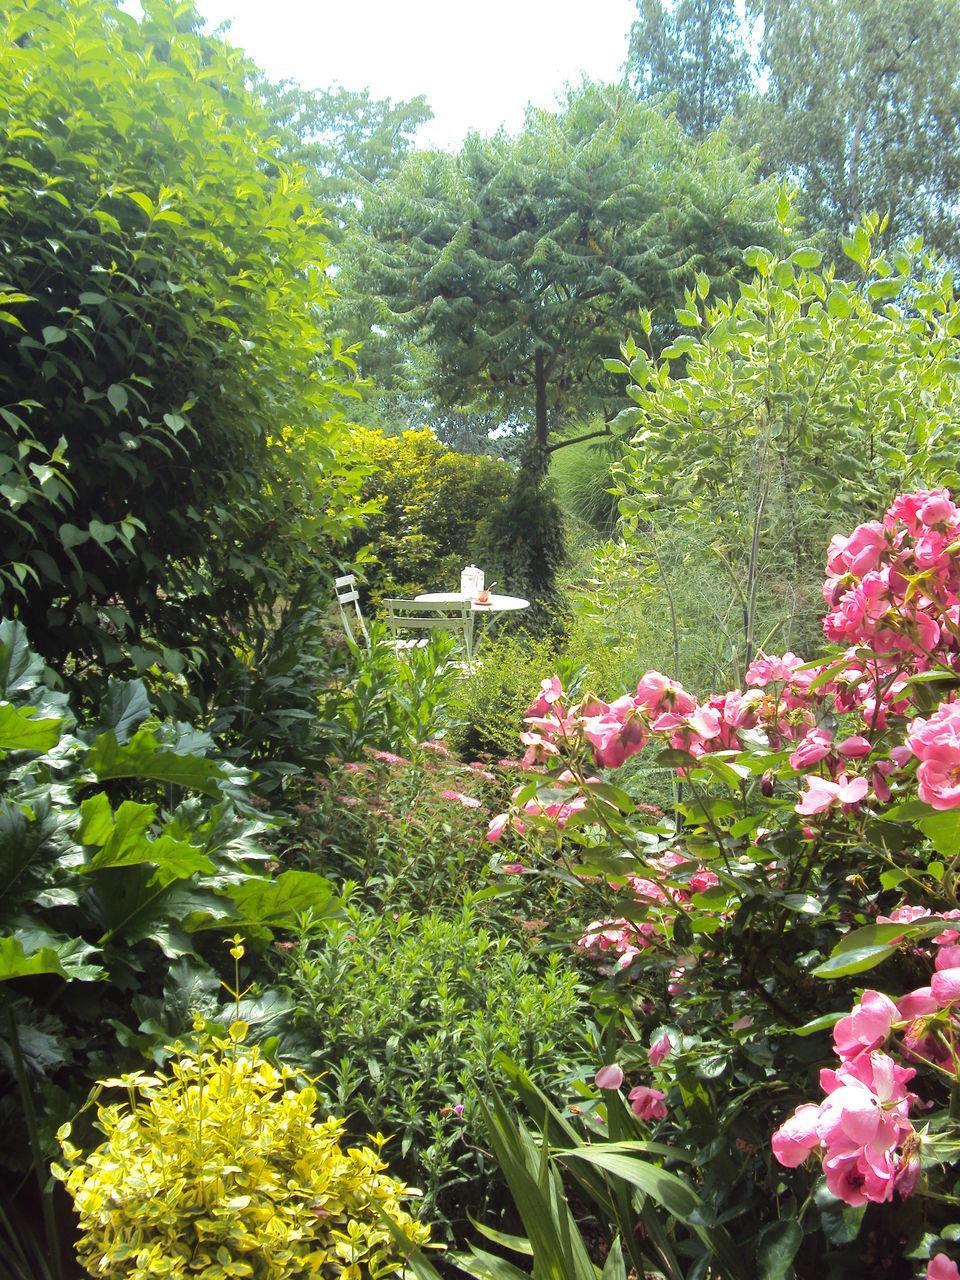 PINK FLOWERING PLANT IN GARDEN